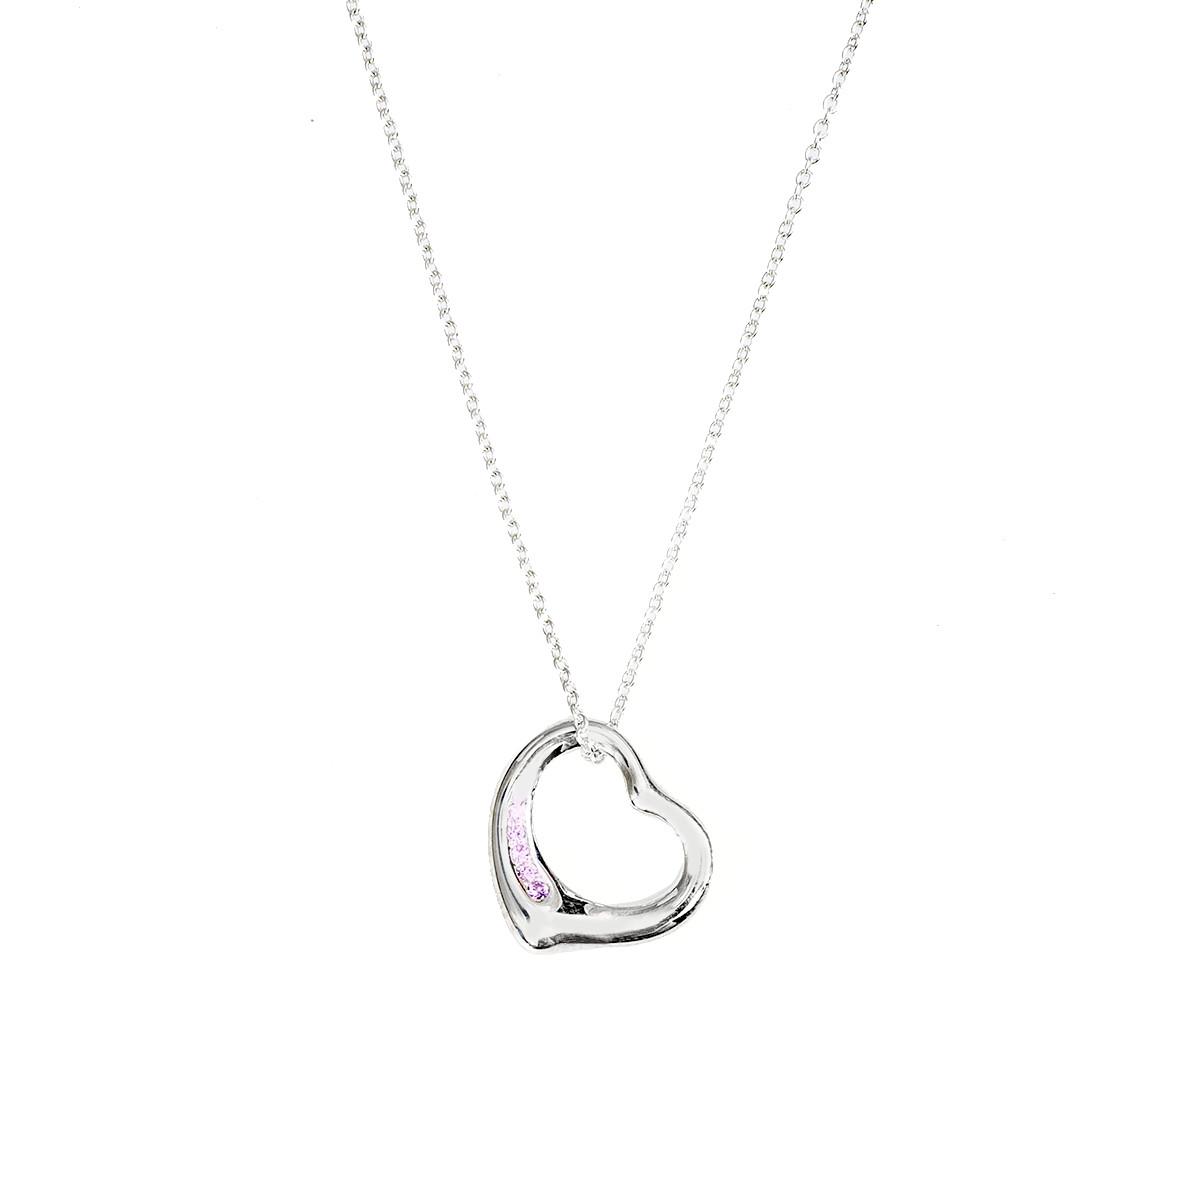 8bec04559 Vintage Tiffany & Co. Elsa Peretti Pink Sapphire Open Heart Pendant Gallery  Image